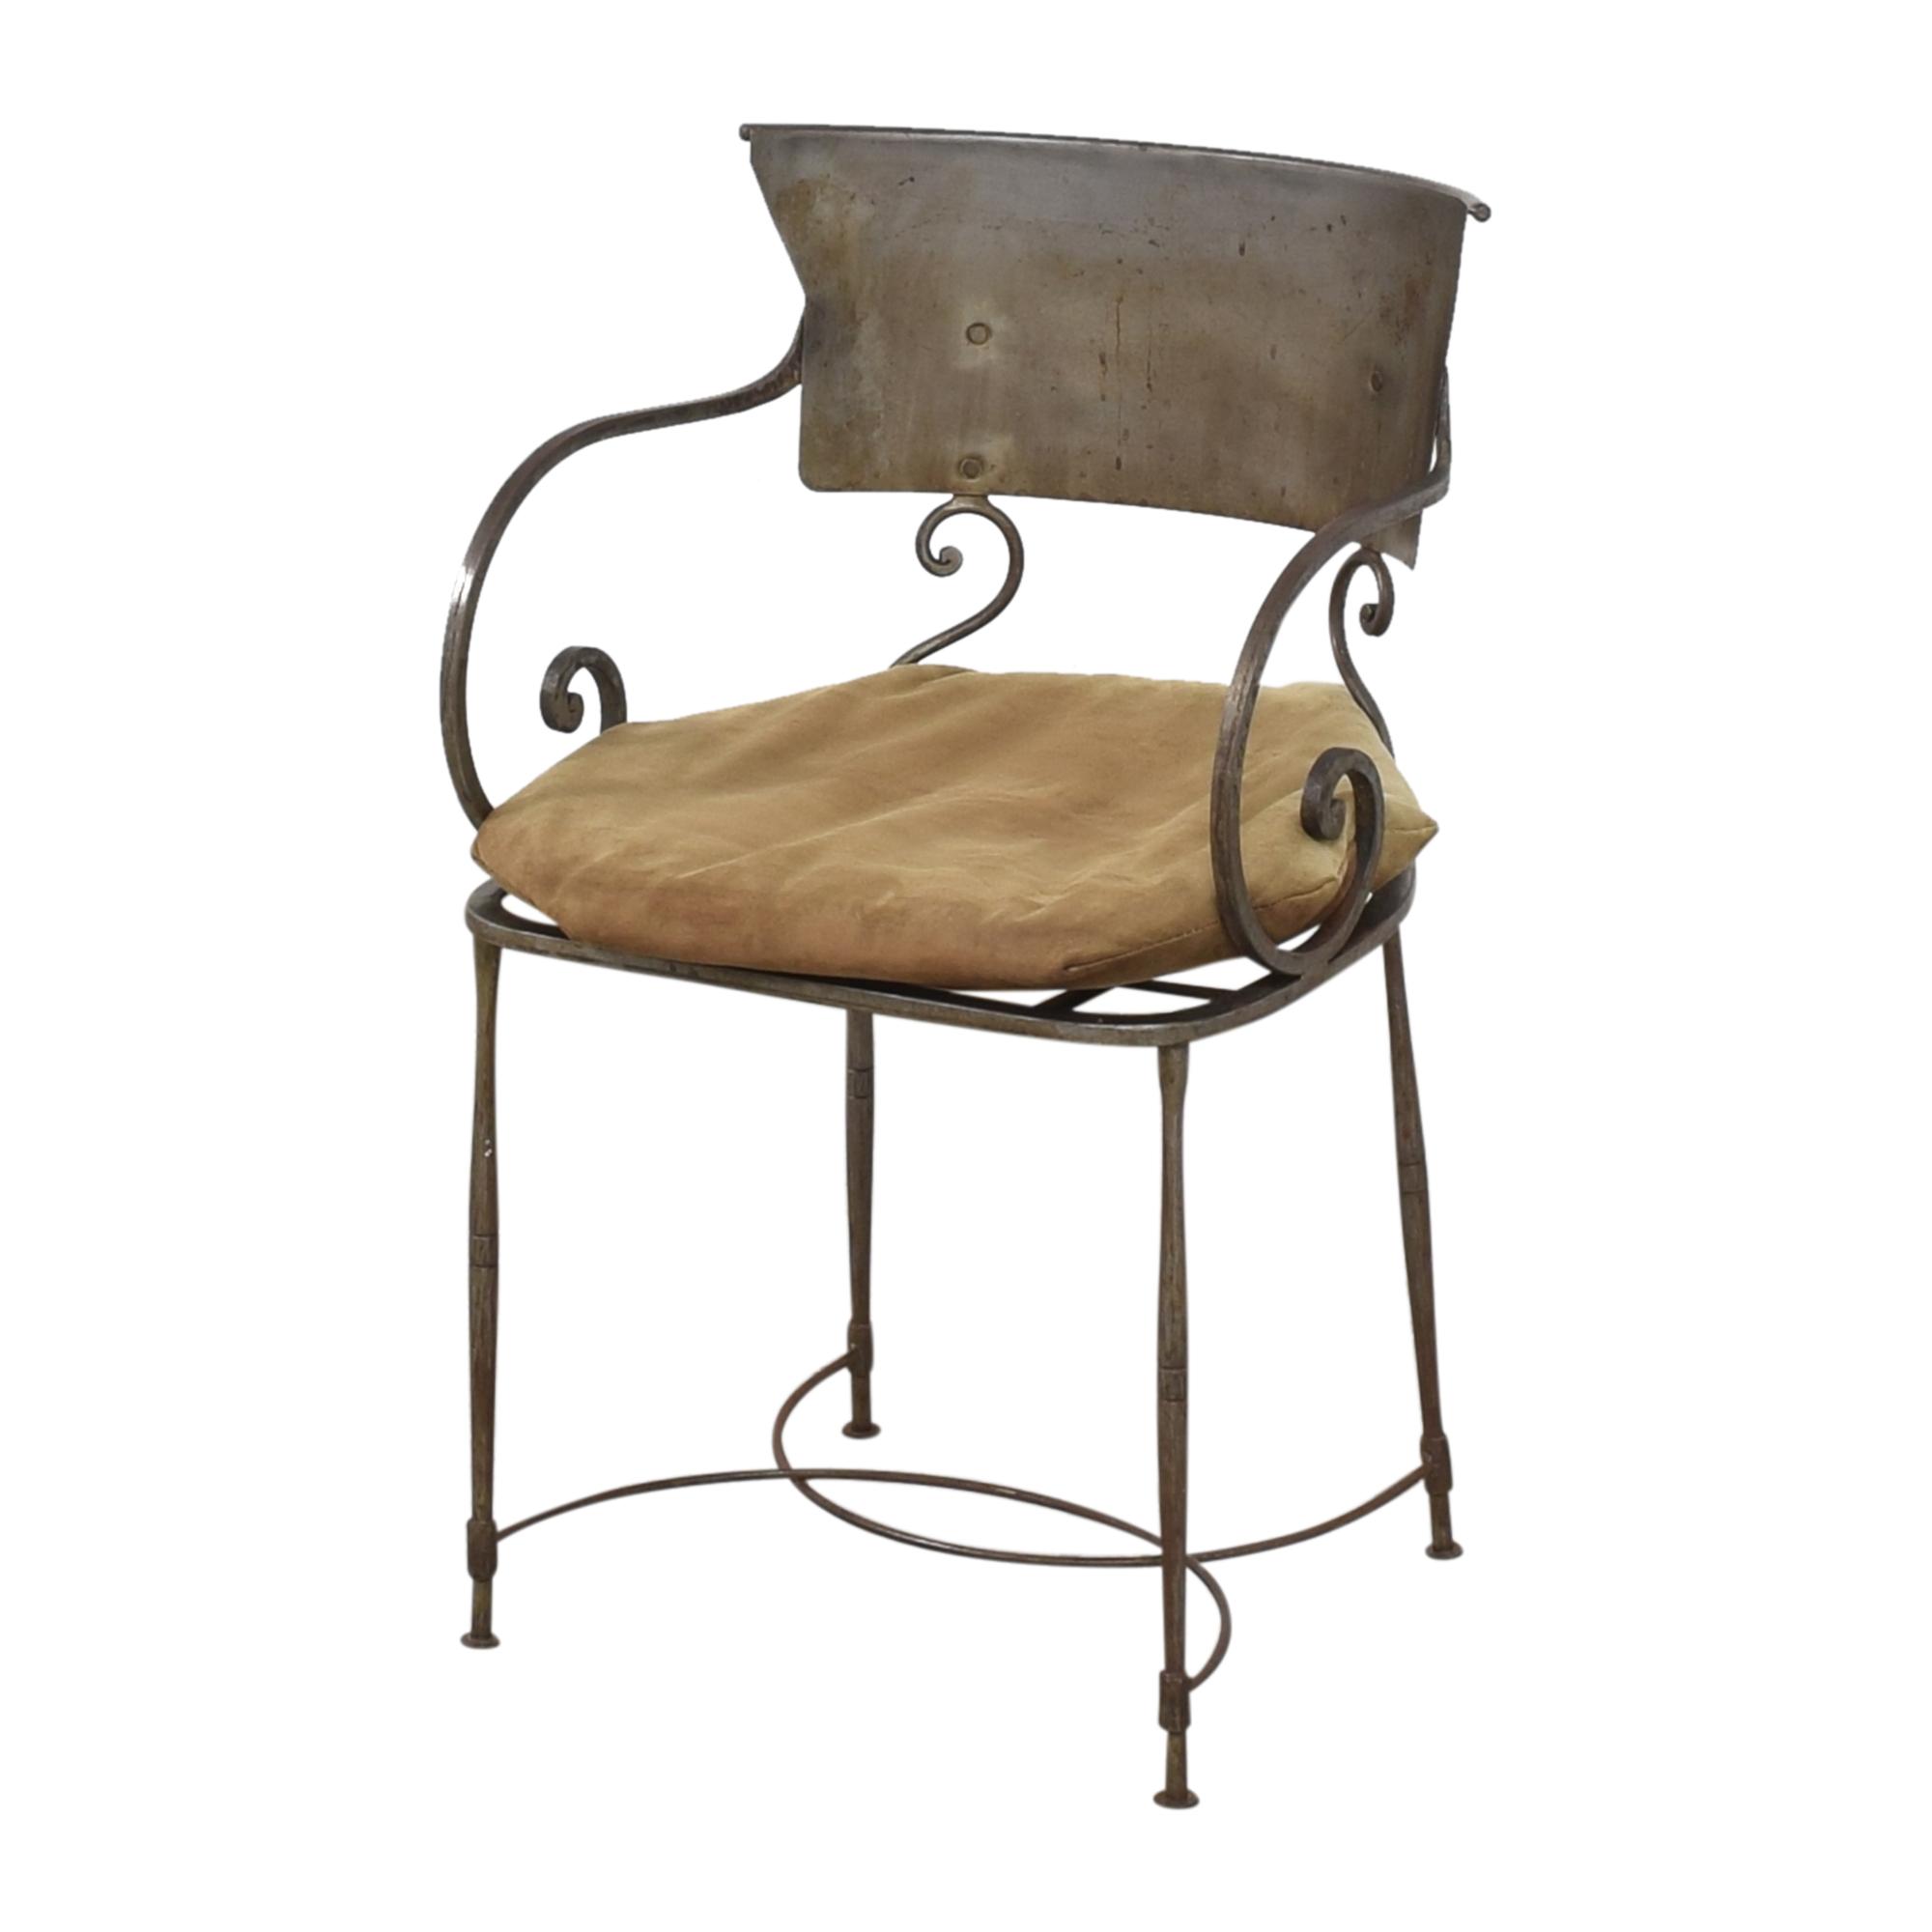 Bloomingdale's Bloomingdale's Art Deco-Style Chairs nyc